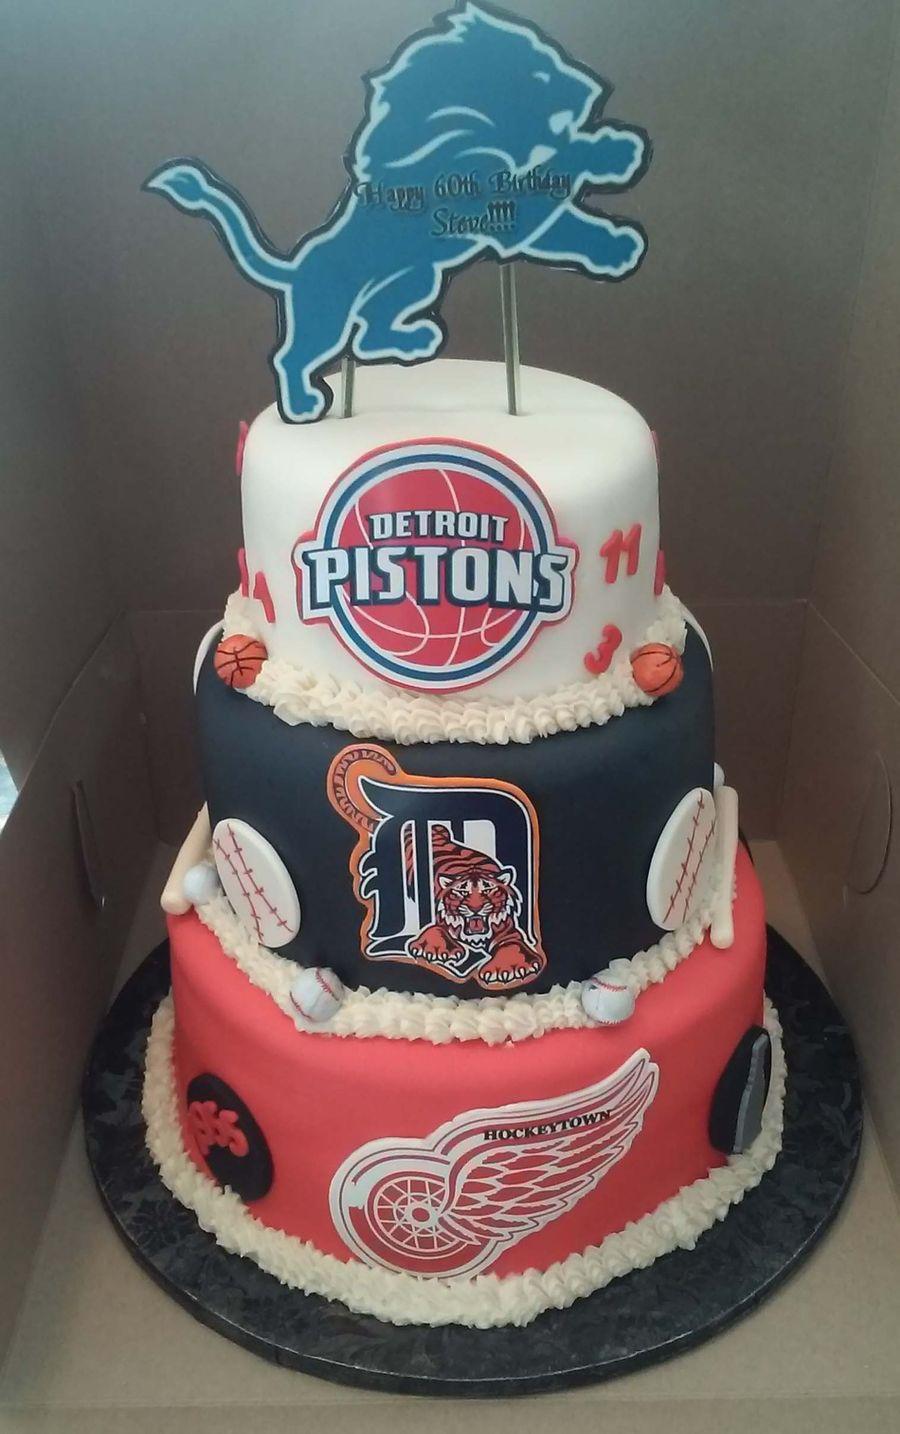 Enjoyable 3 Tier Detroit Sport Teams Themed Birthday Cake Cakecentral Com Birthday Cards Printable Benkemecafe Filternl